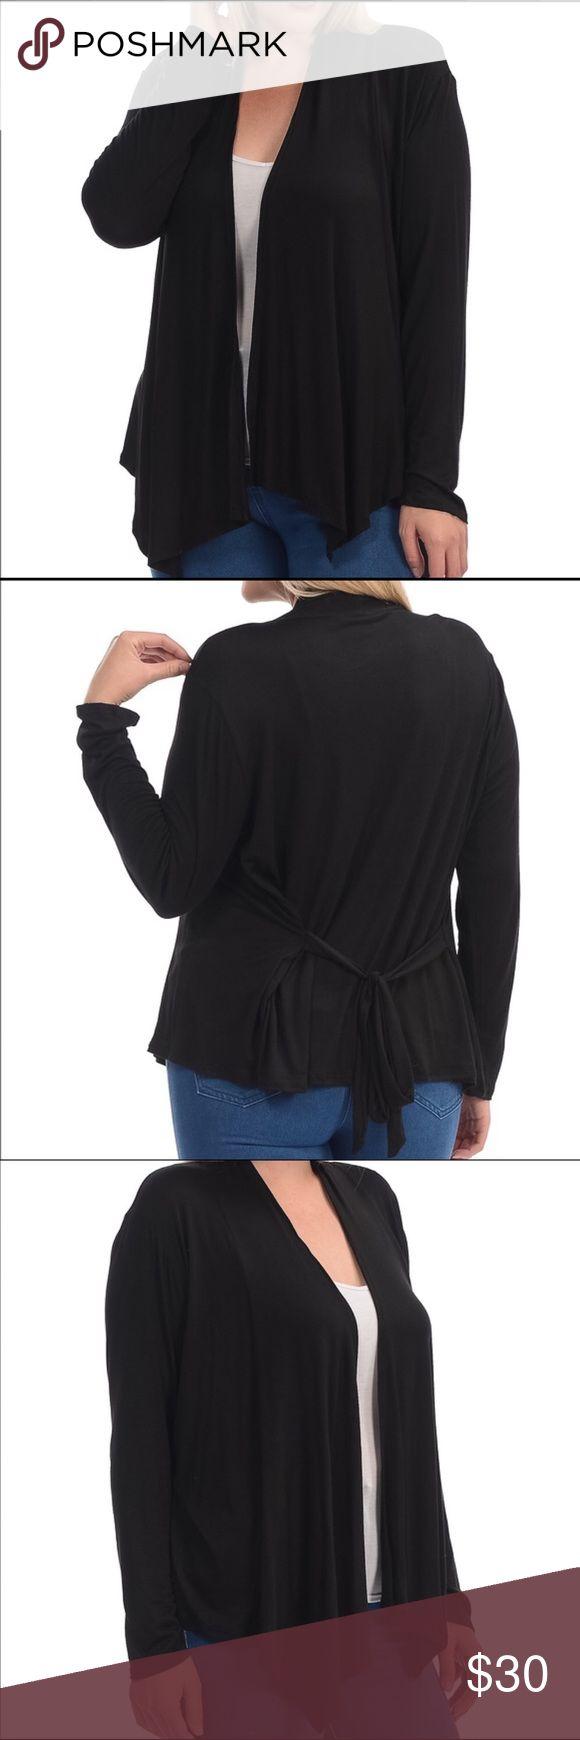 17 beste ideer om Black Cardigan Sweater på Pinterest